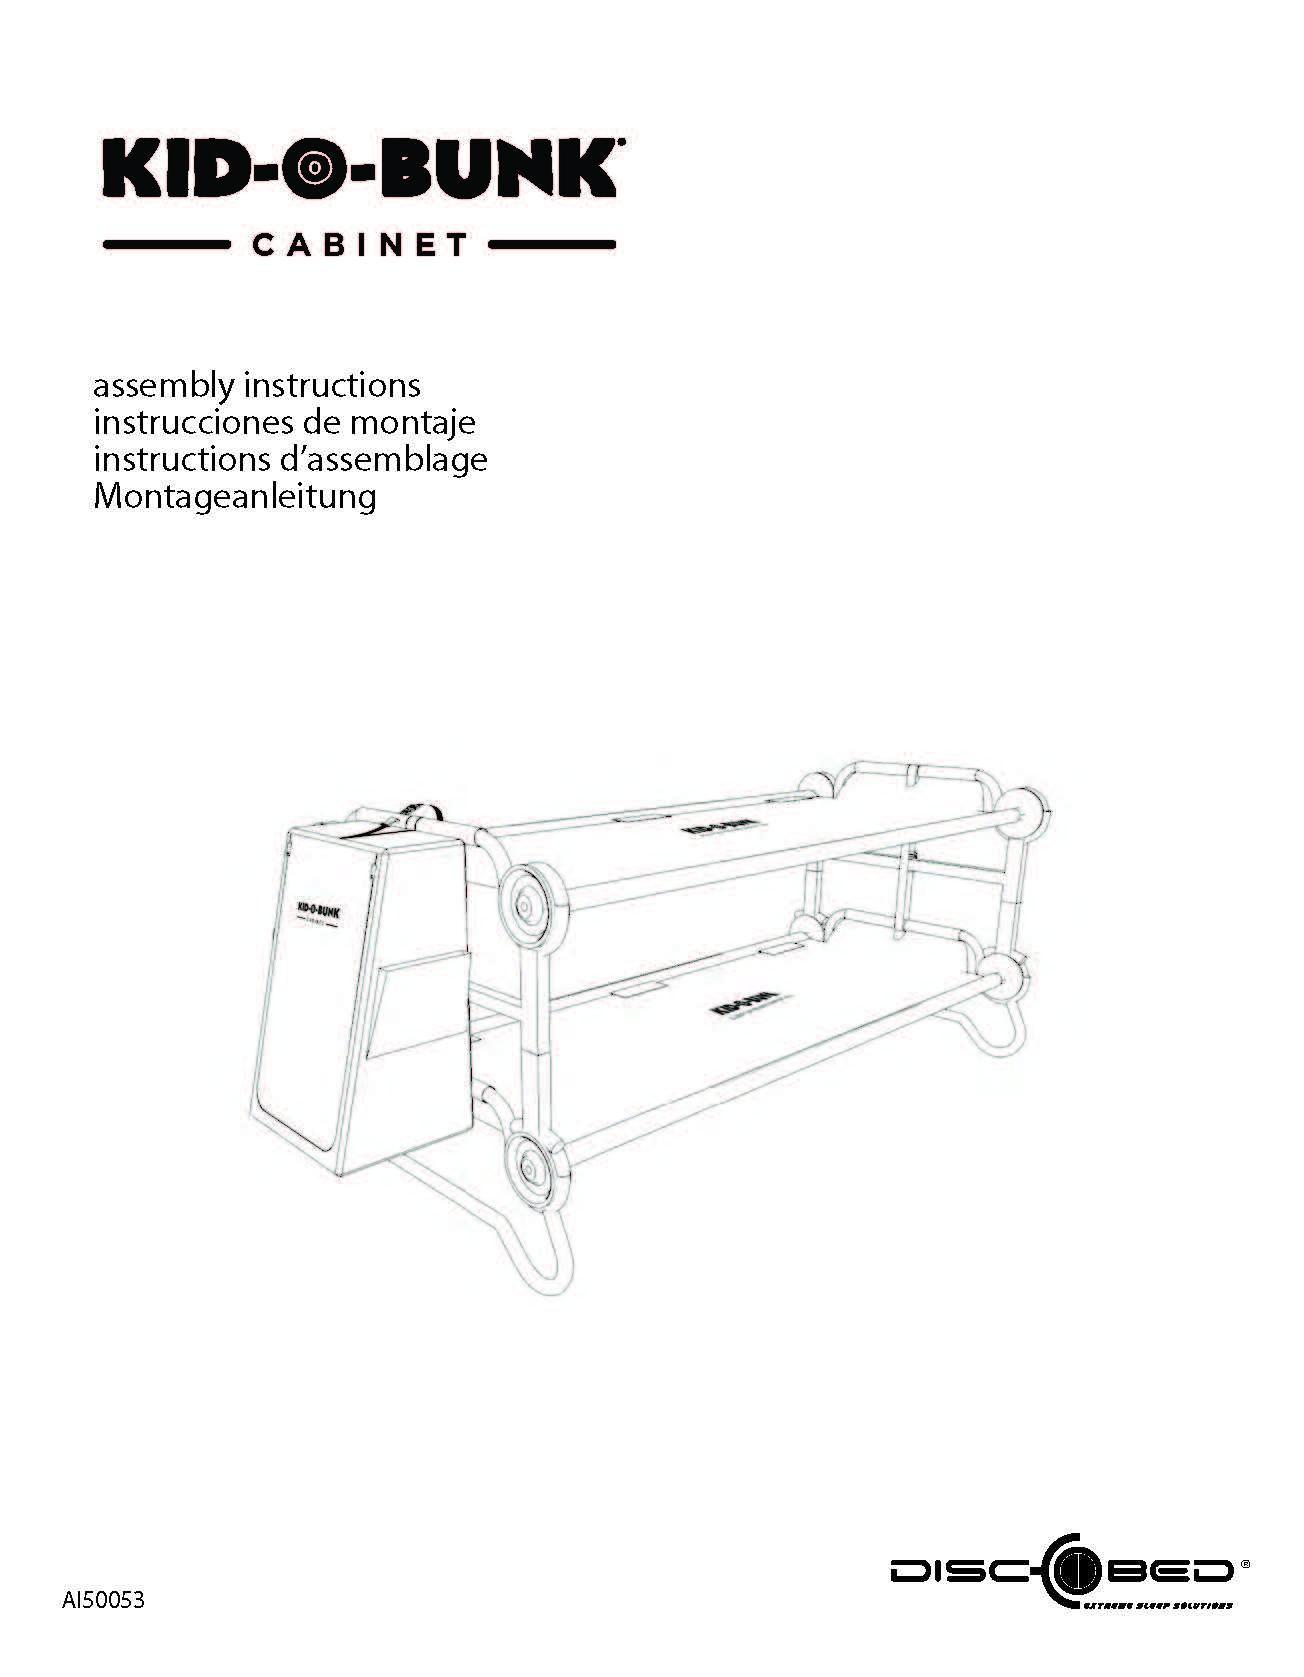 kob-cabinet